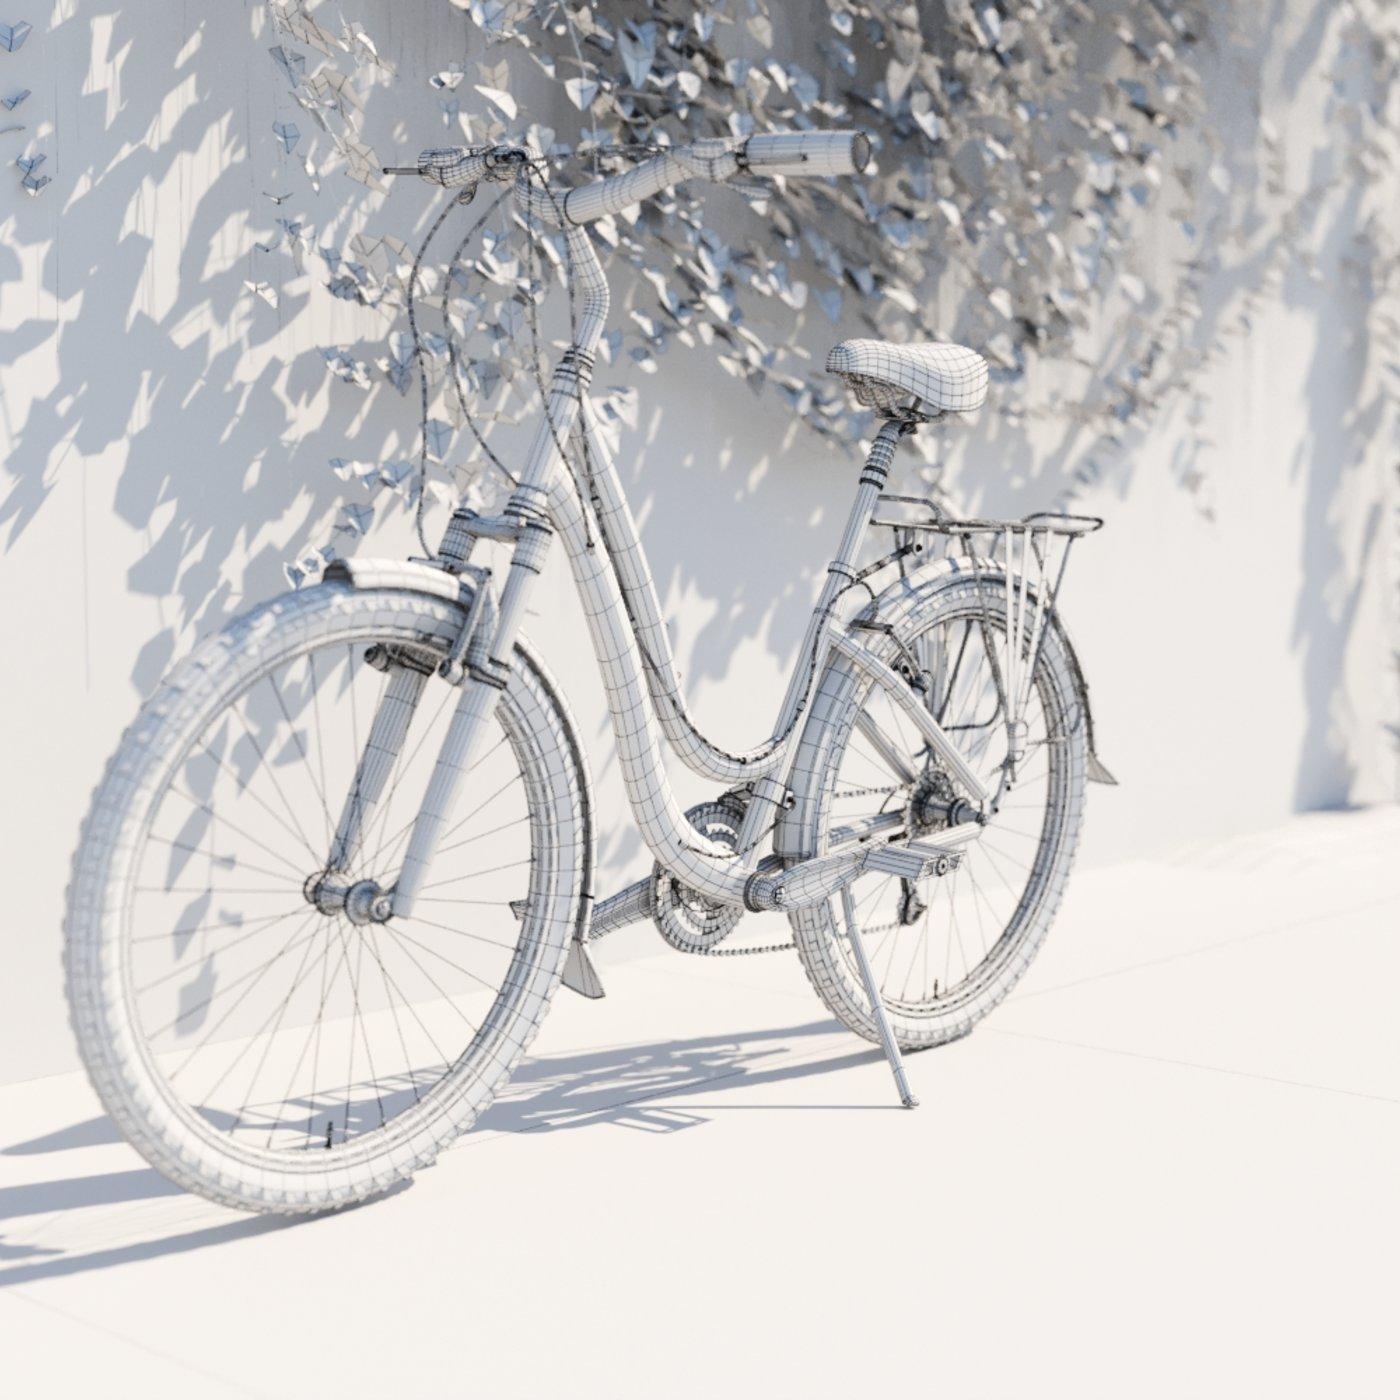 Bike in the village